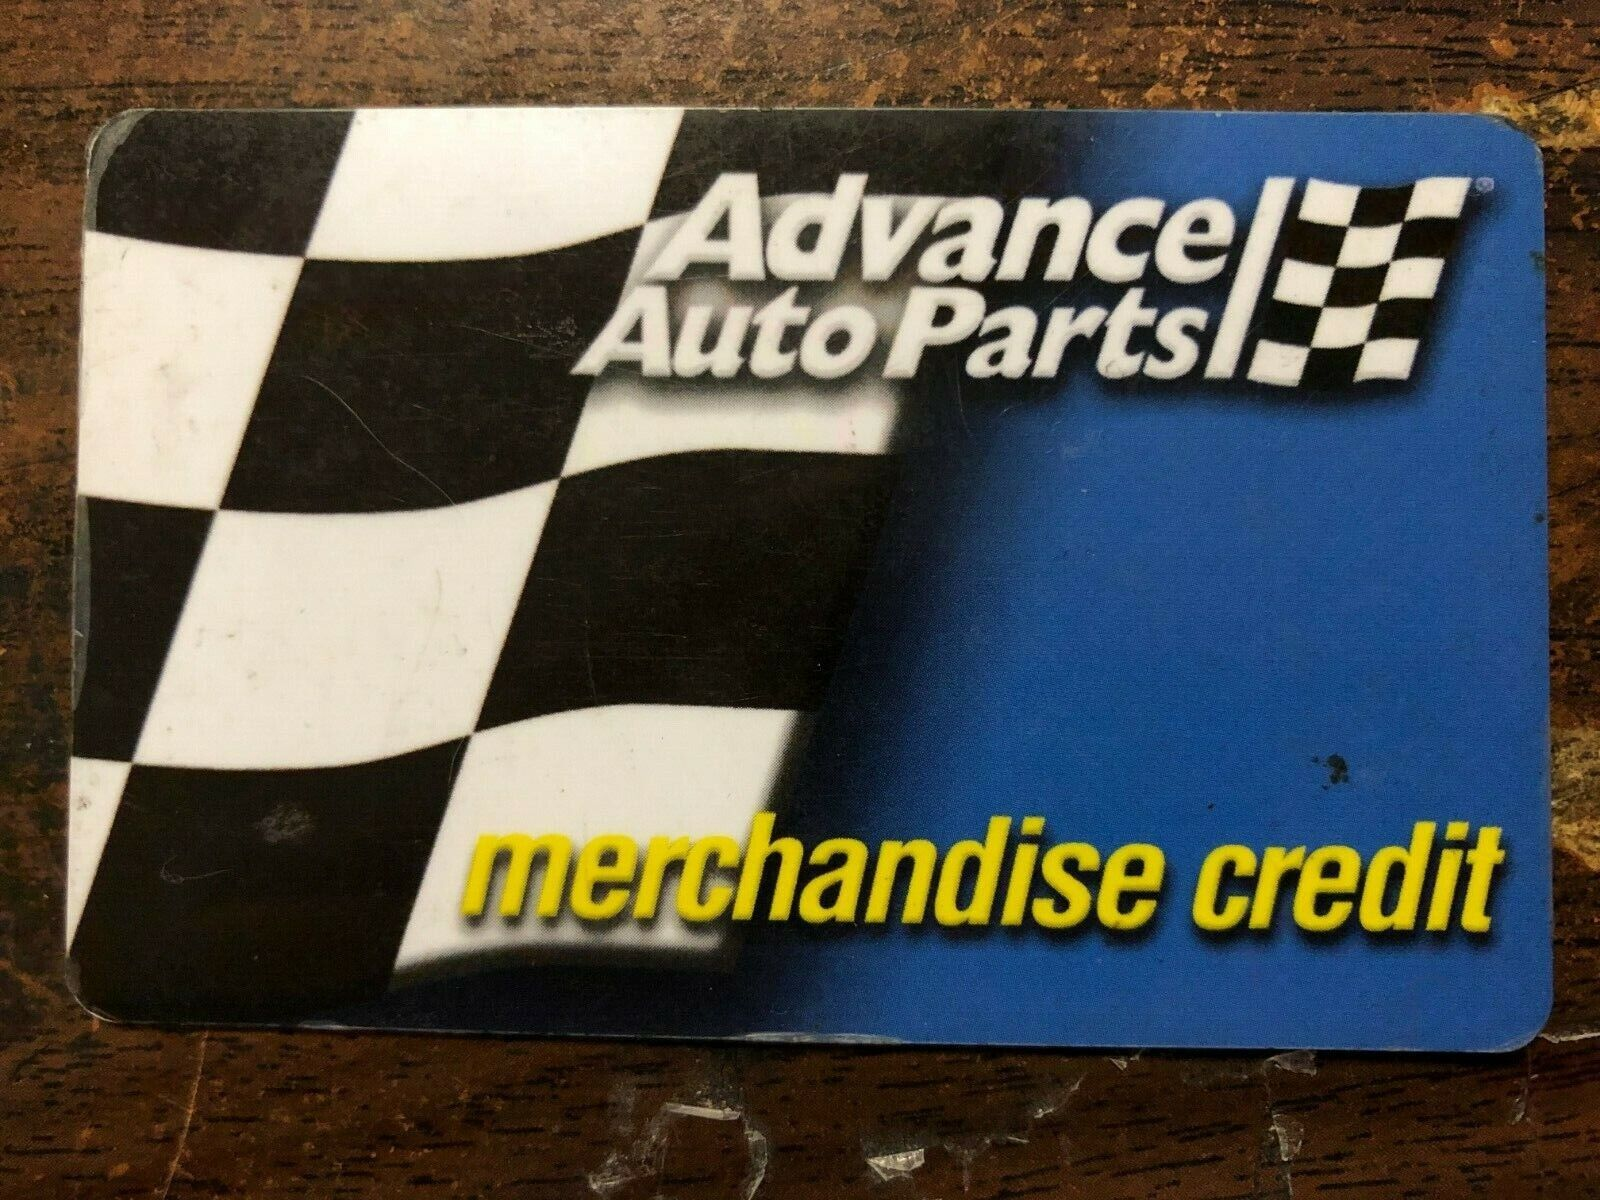 89.91 Advance Auto Parts Gift Card Merchandise Credit BALANCE 89.91 - $76.00